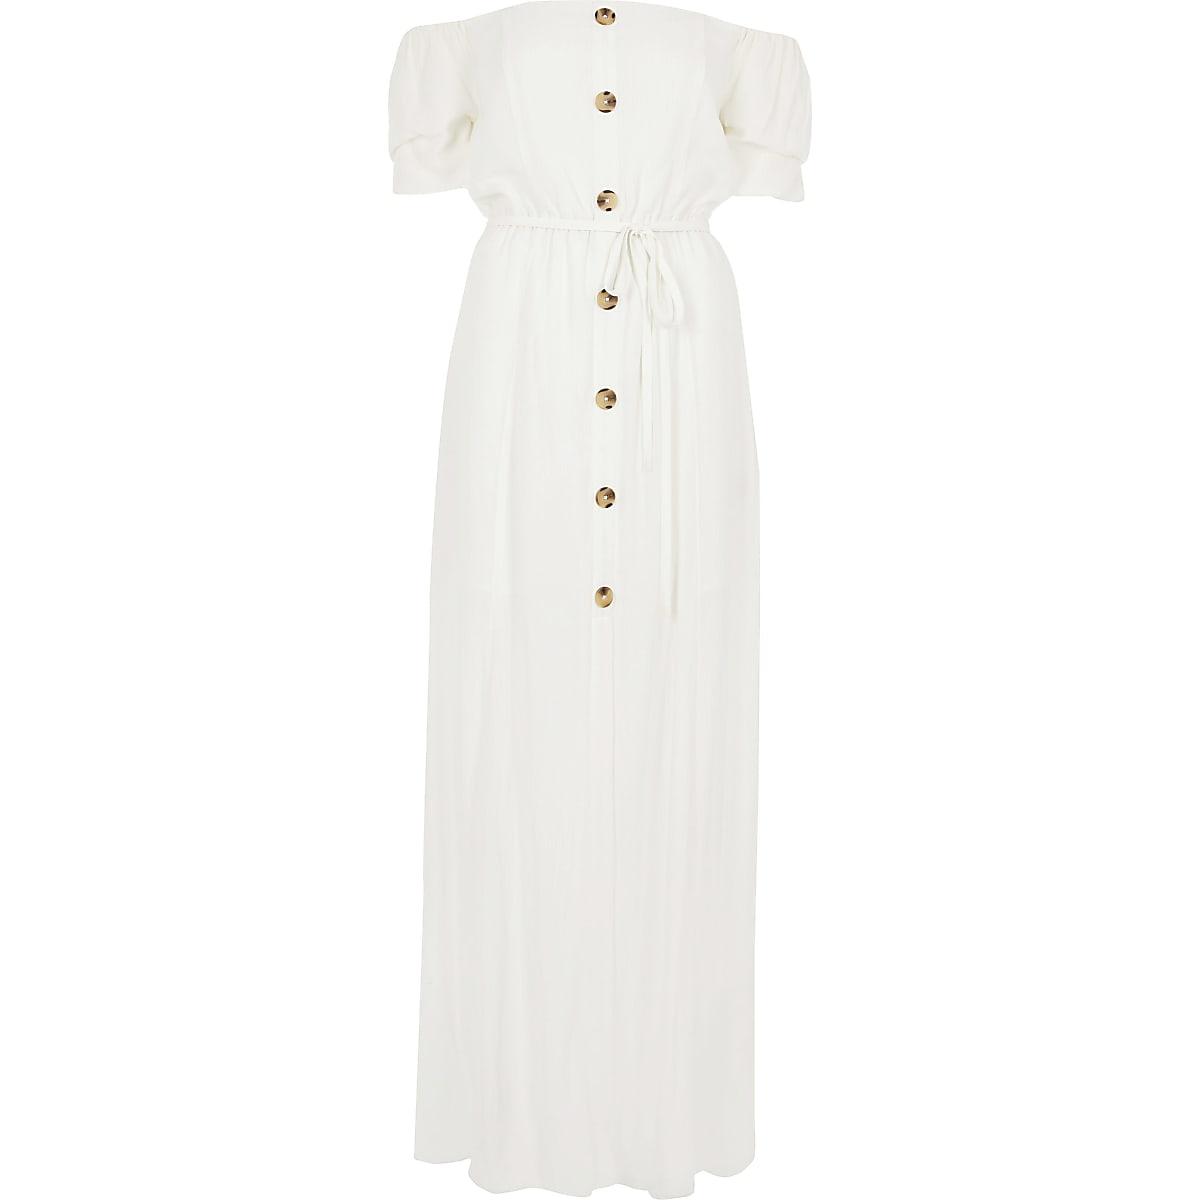 55ca9a817b8 White bardot button front maxi dress - Maxi Dresses - Dresses - women